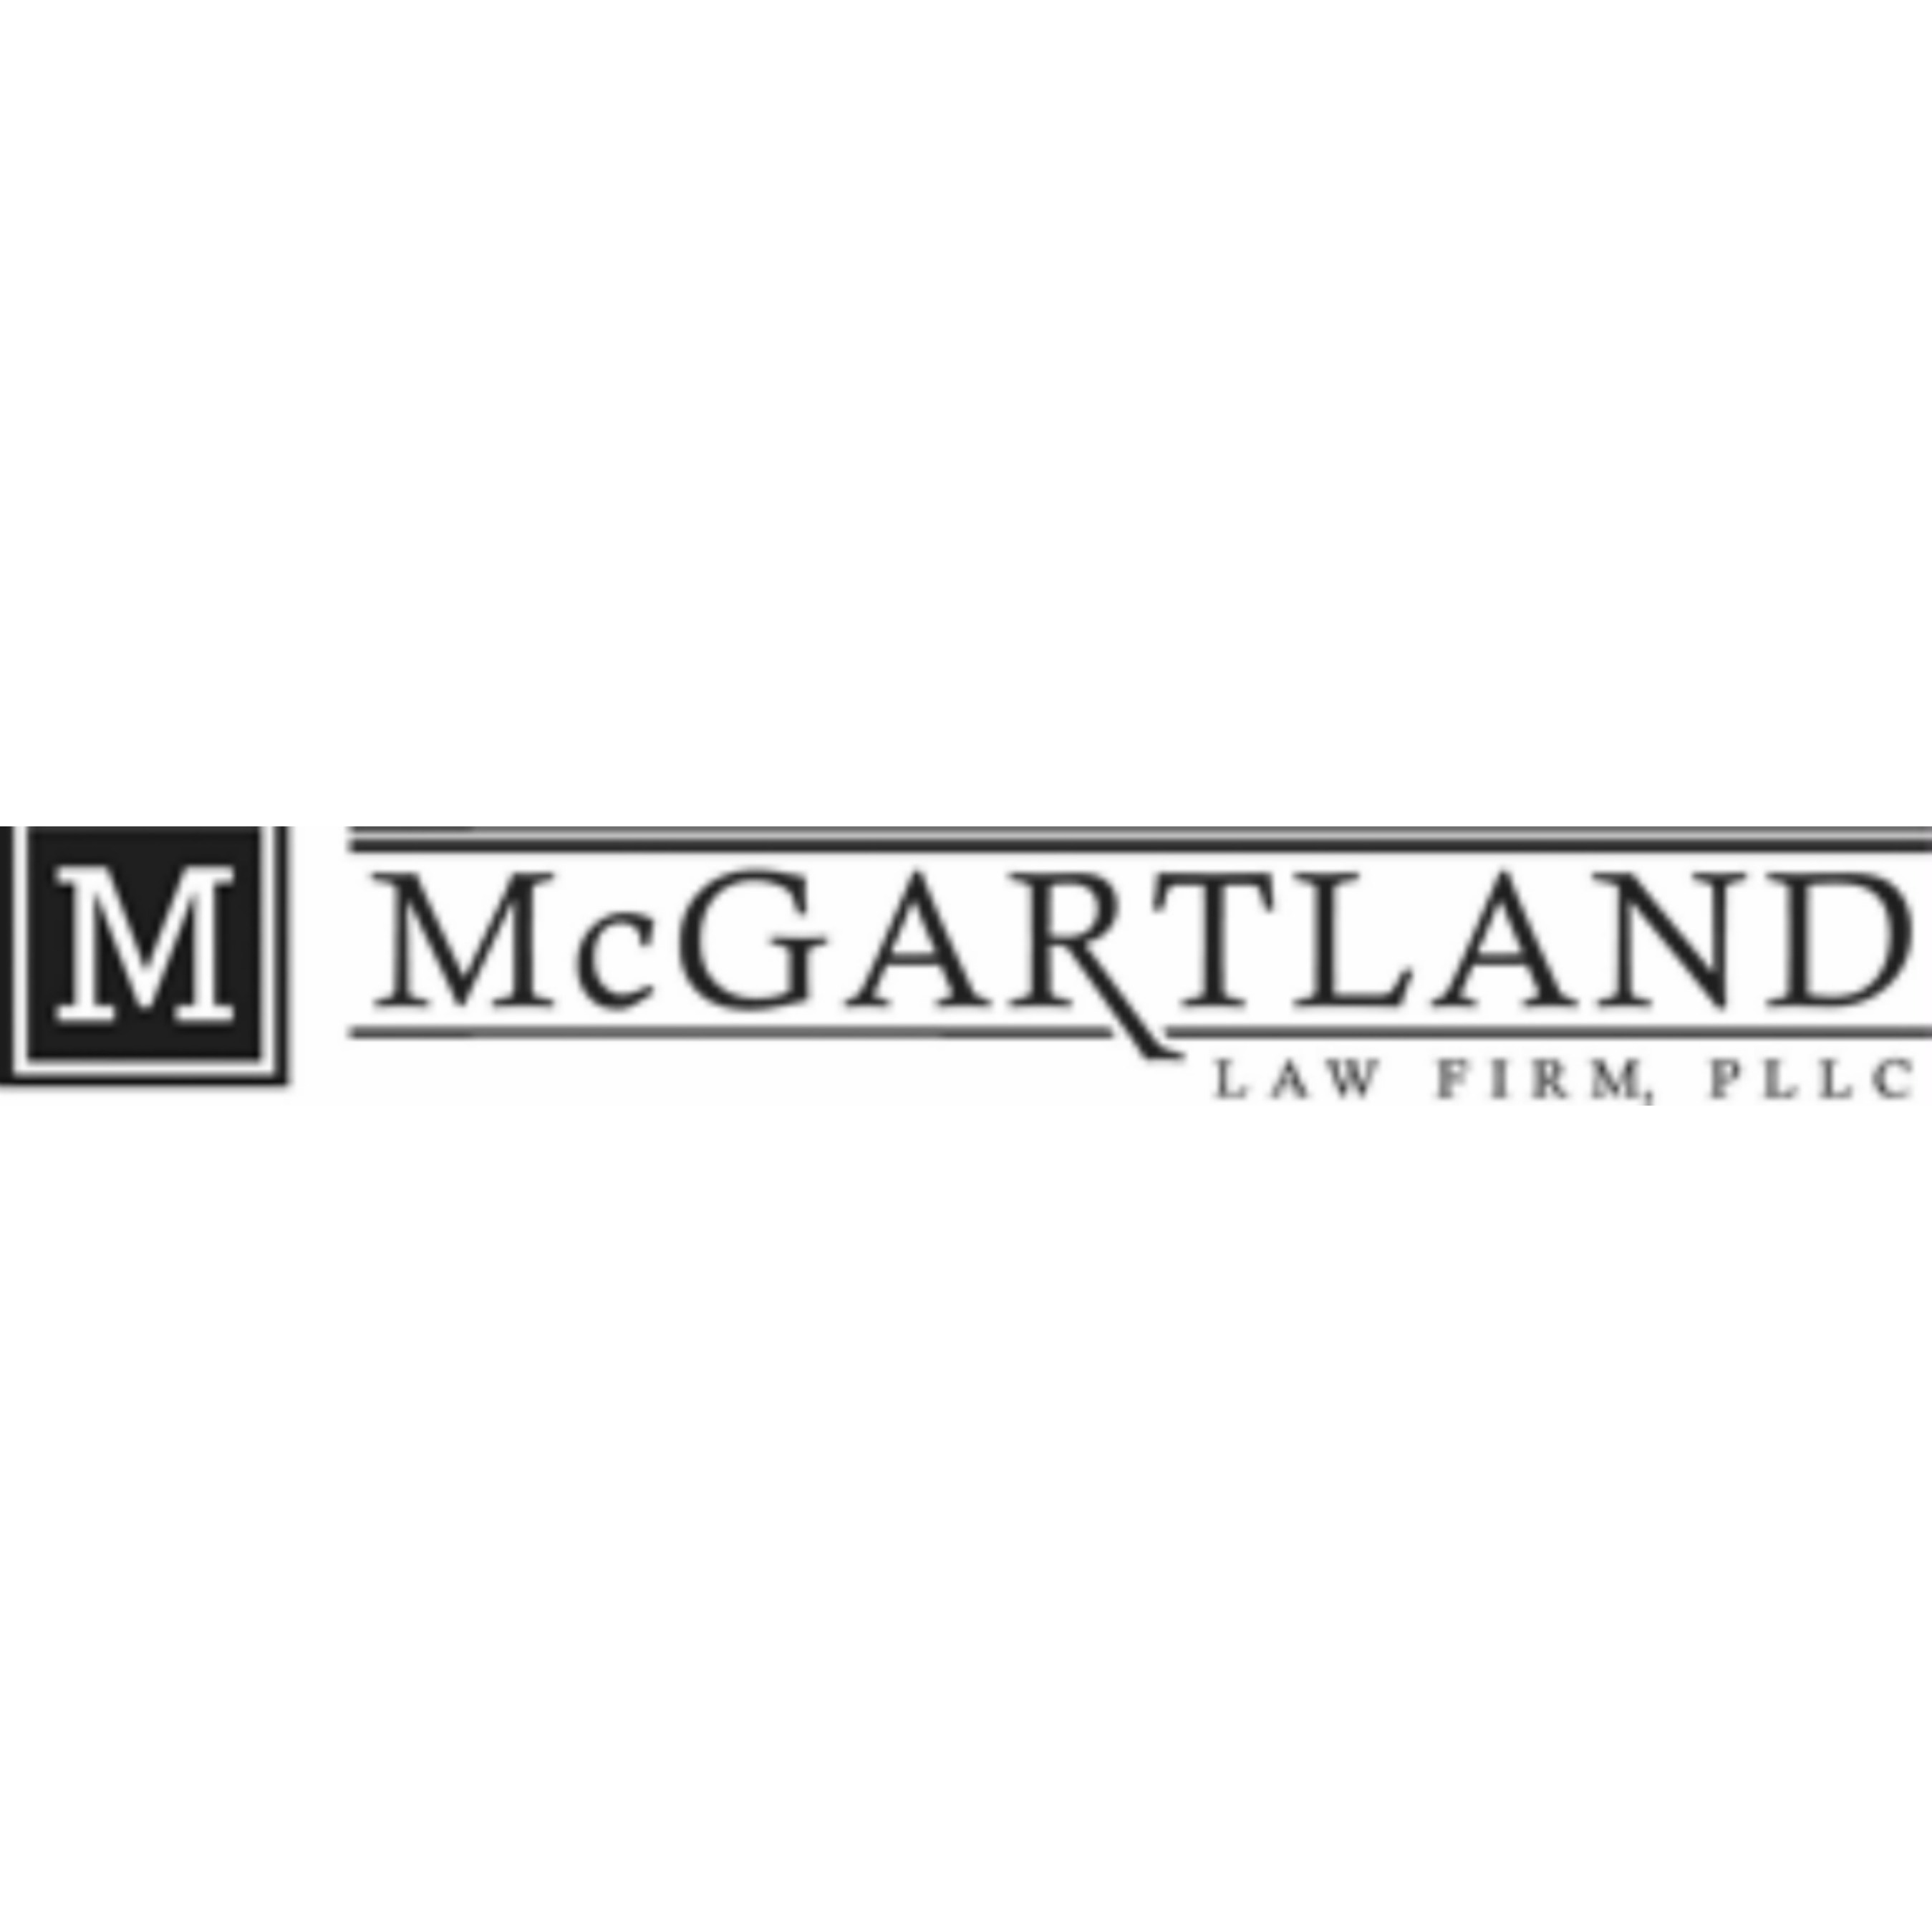 McGartland Law Firm, PLLC - ad image